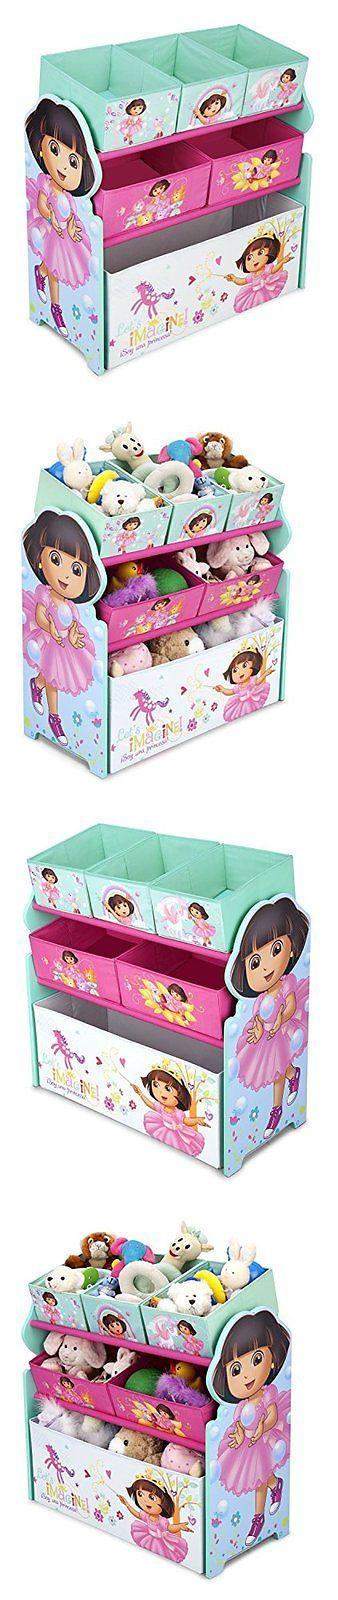 Dora the Explorer 44039: Multi Bin Toy Organizer, Nick Jr. Dora The Explorer -> BUY IT NOW ONLY: $32.99 on eBay!